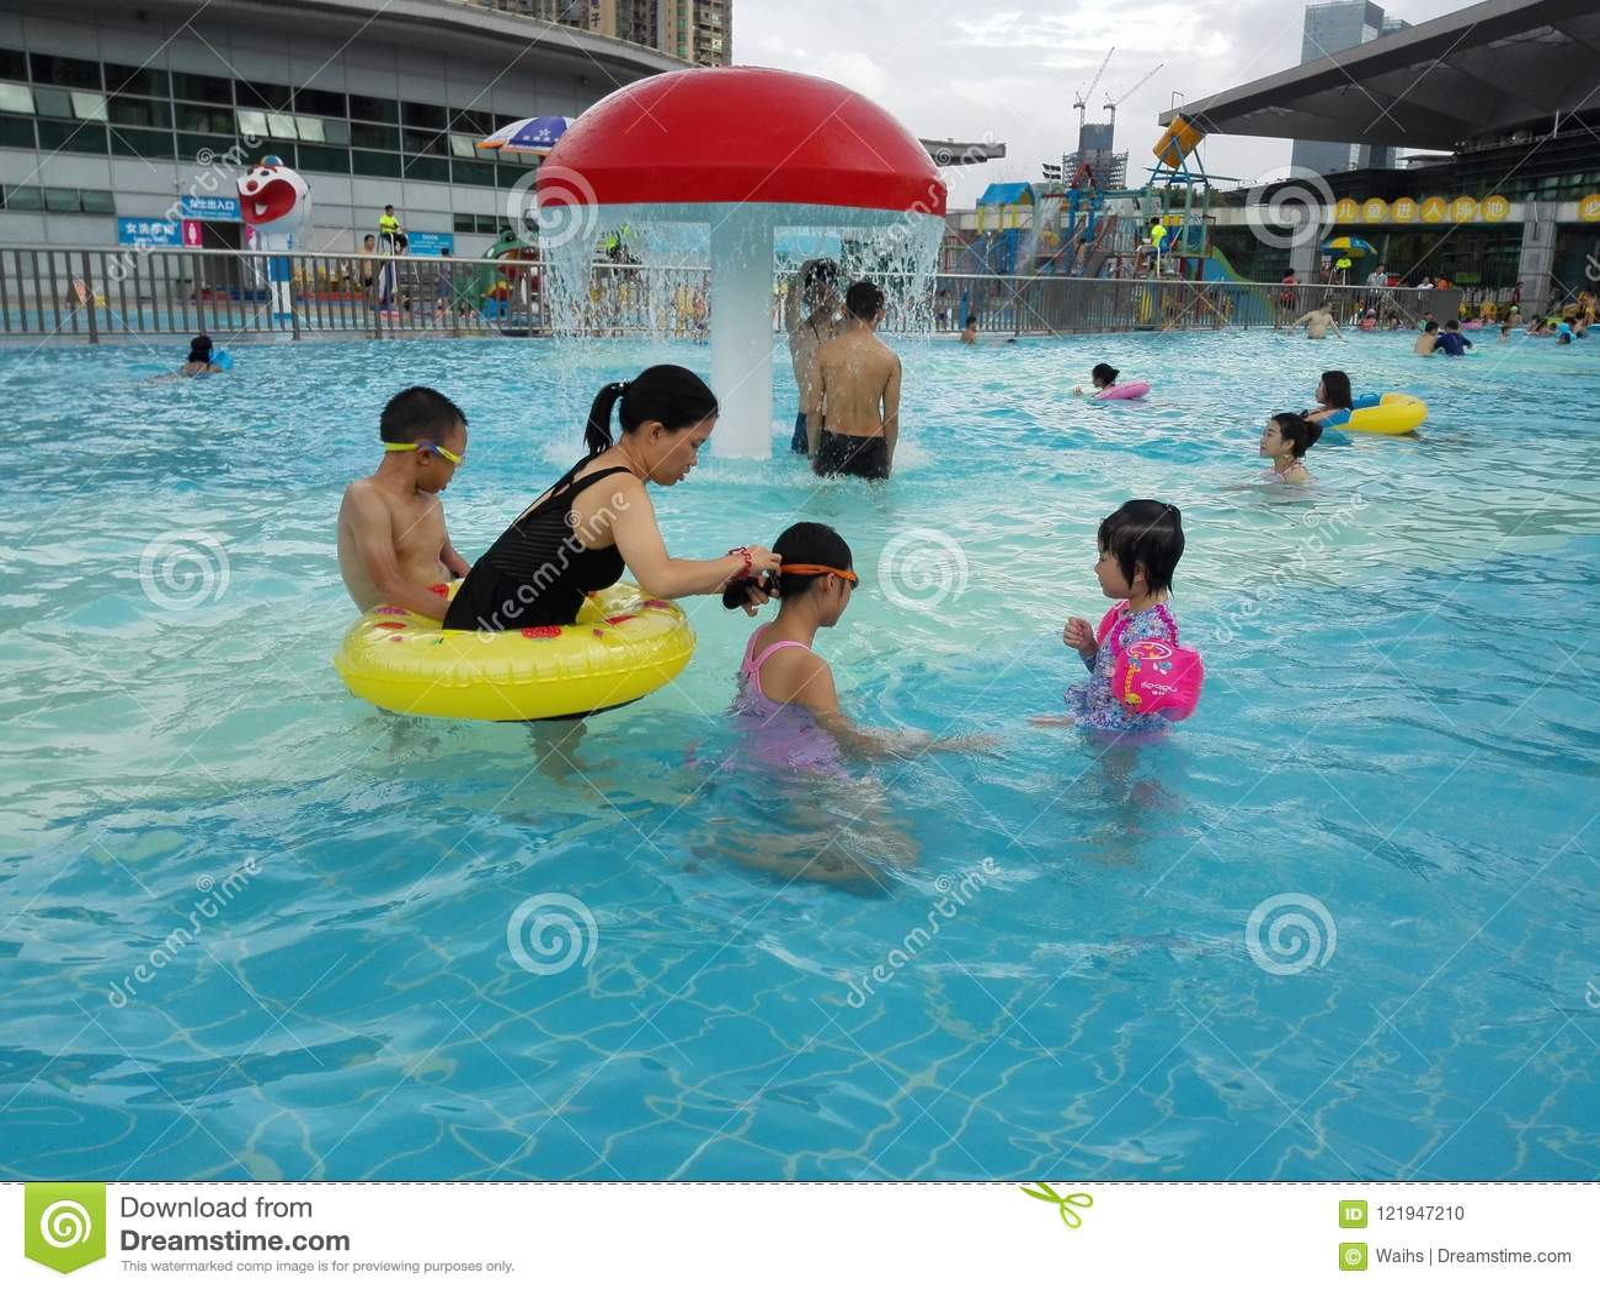 2bd16a9839 Shenzhen, China: Gymnasium Swimming Pool, Men, Women And Children ...